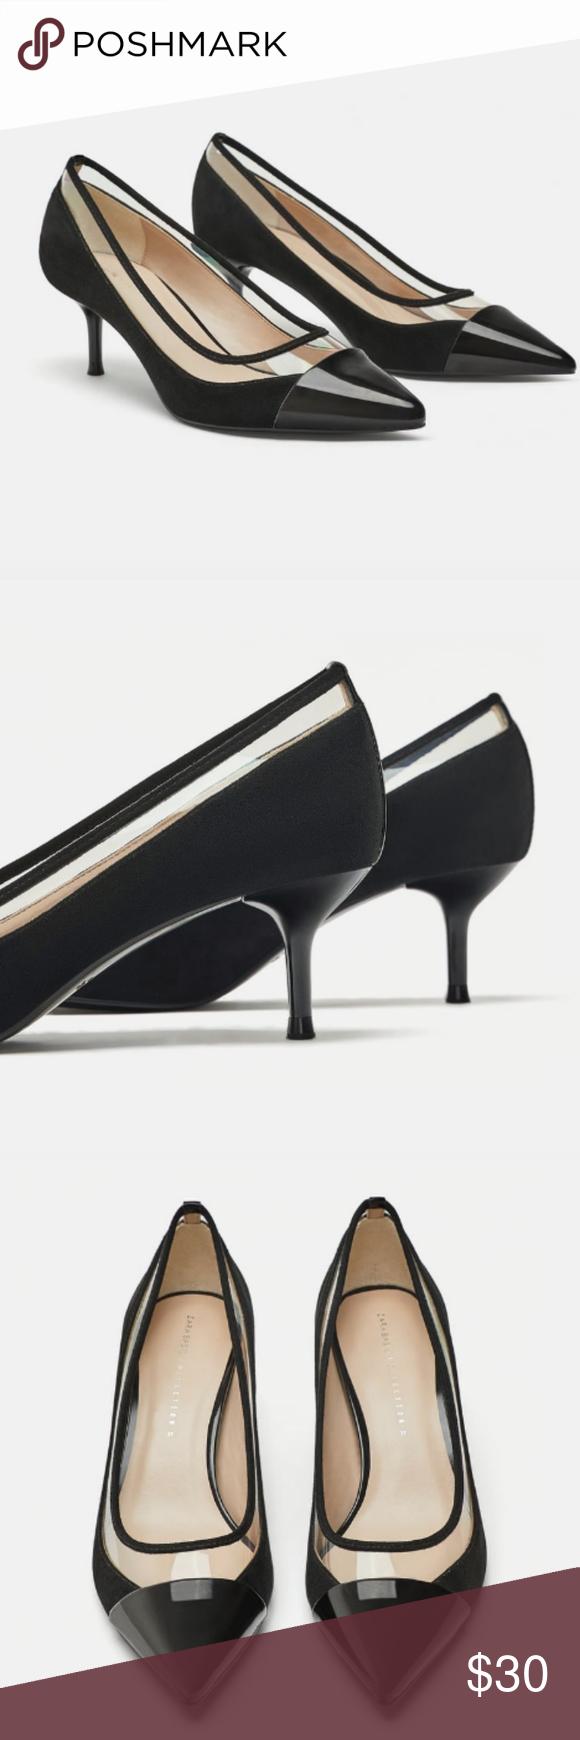 02619e44fda Zara Vinyl Mid Heel Shoes Black mid-heel shoes. Combination of materials on  the upper